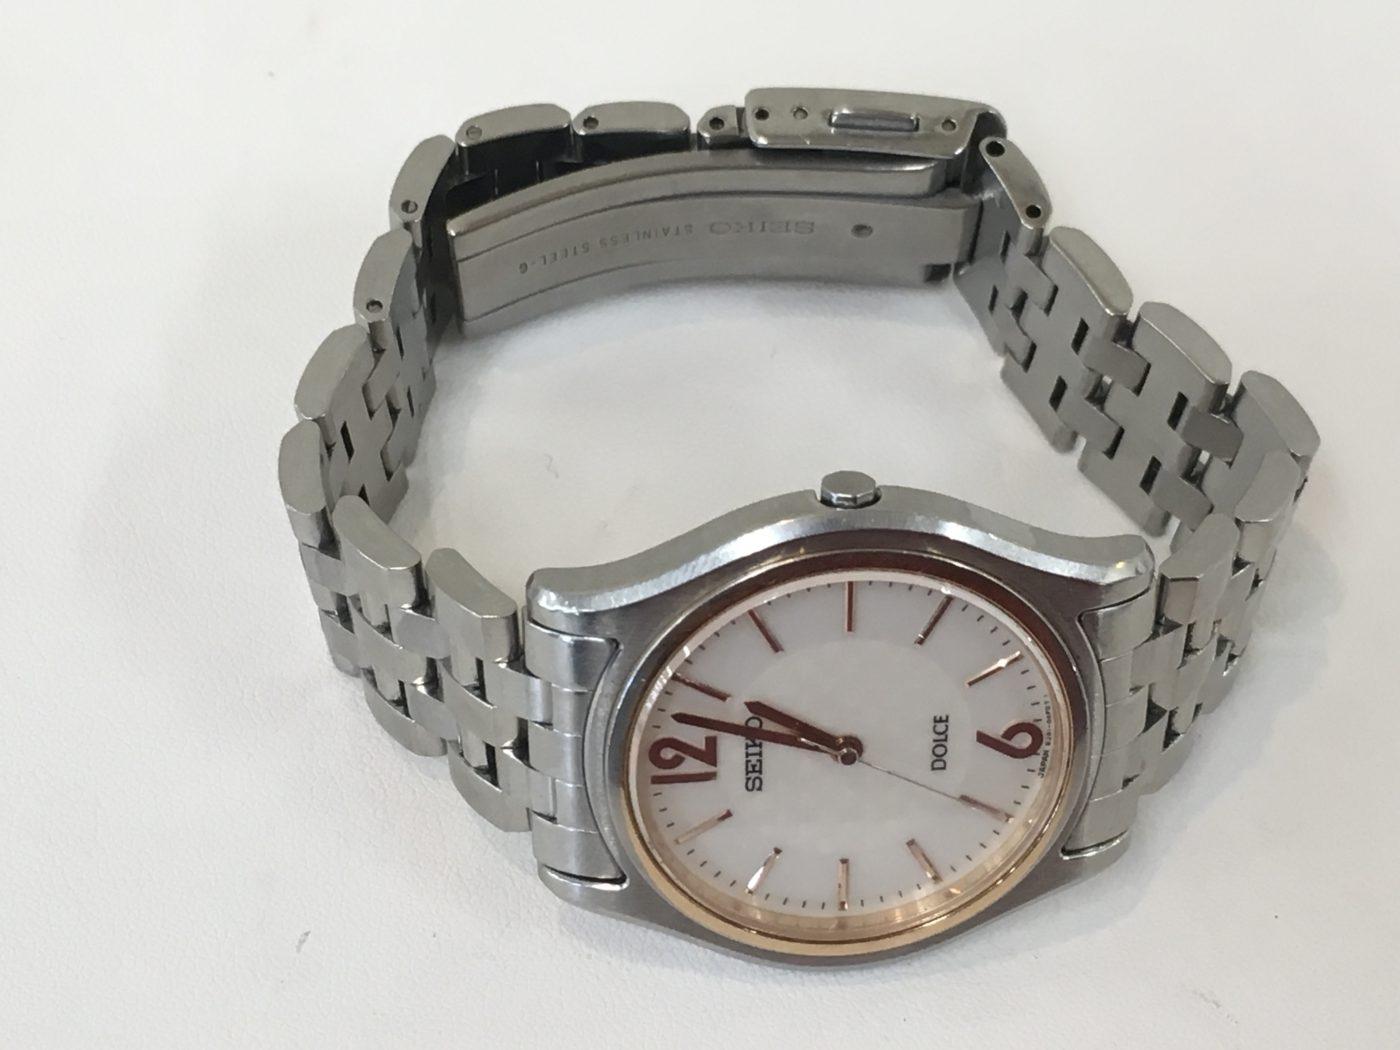 SEIKO DOLCE 腕時計 バンド修理 山梨県 ドルチェ